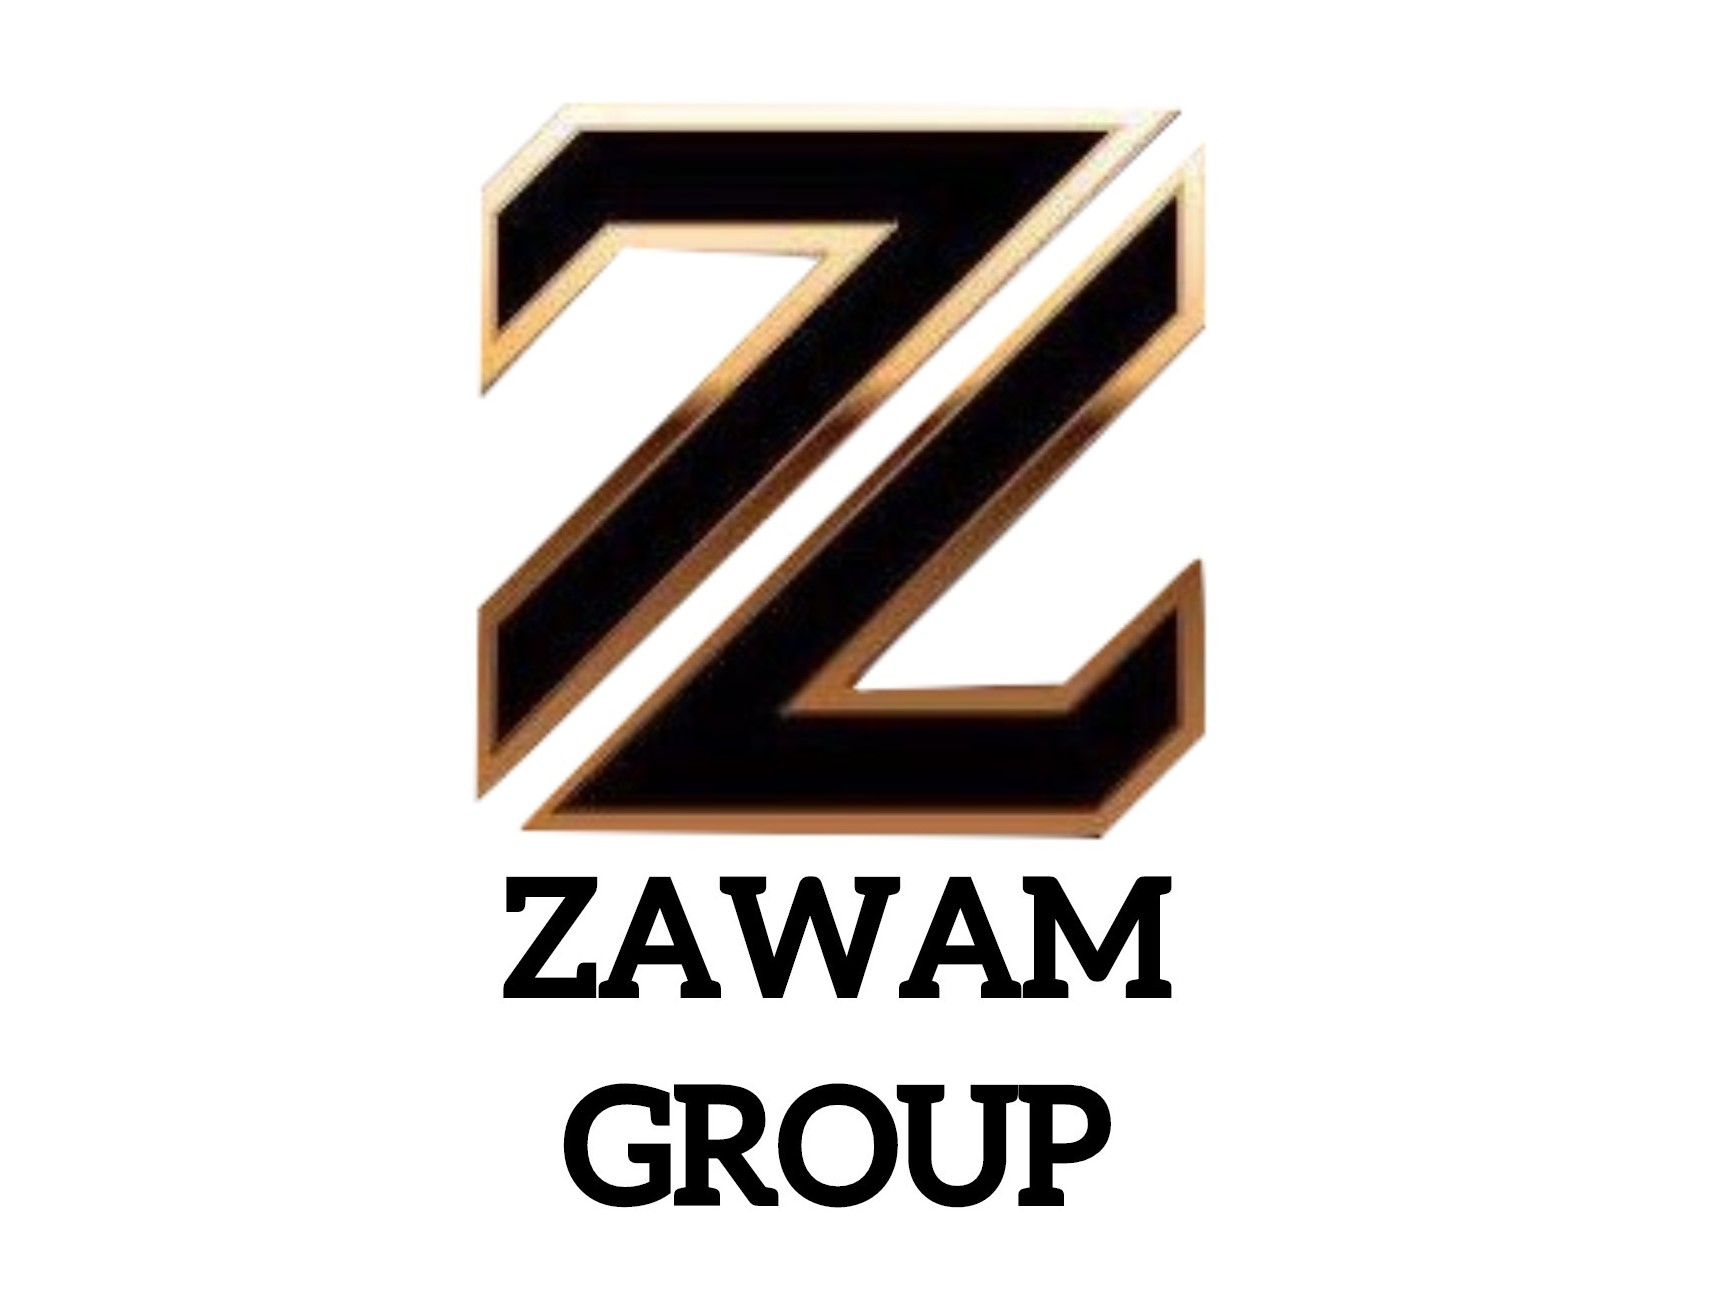 Zawam Group